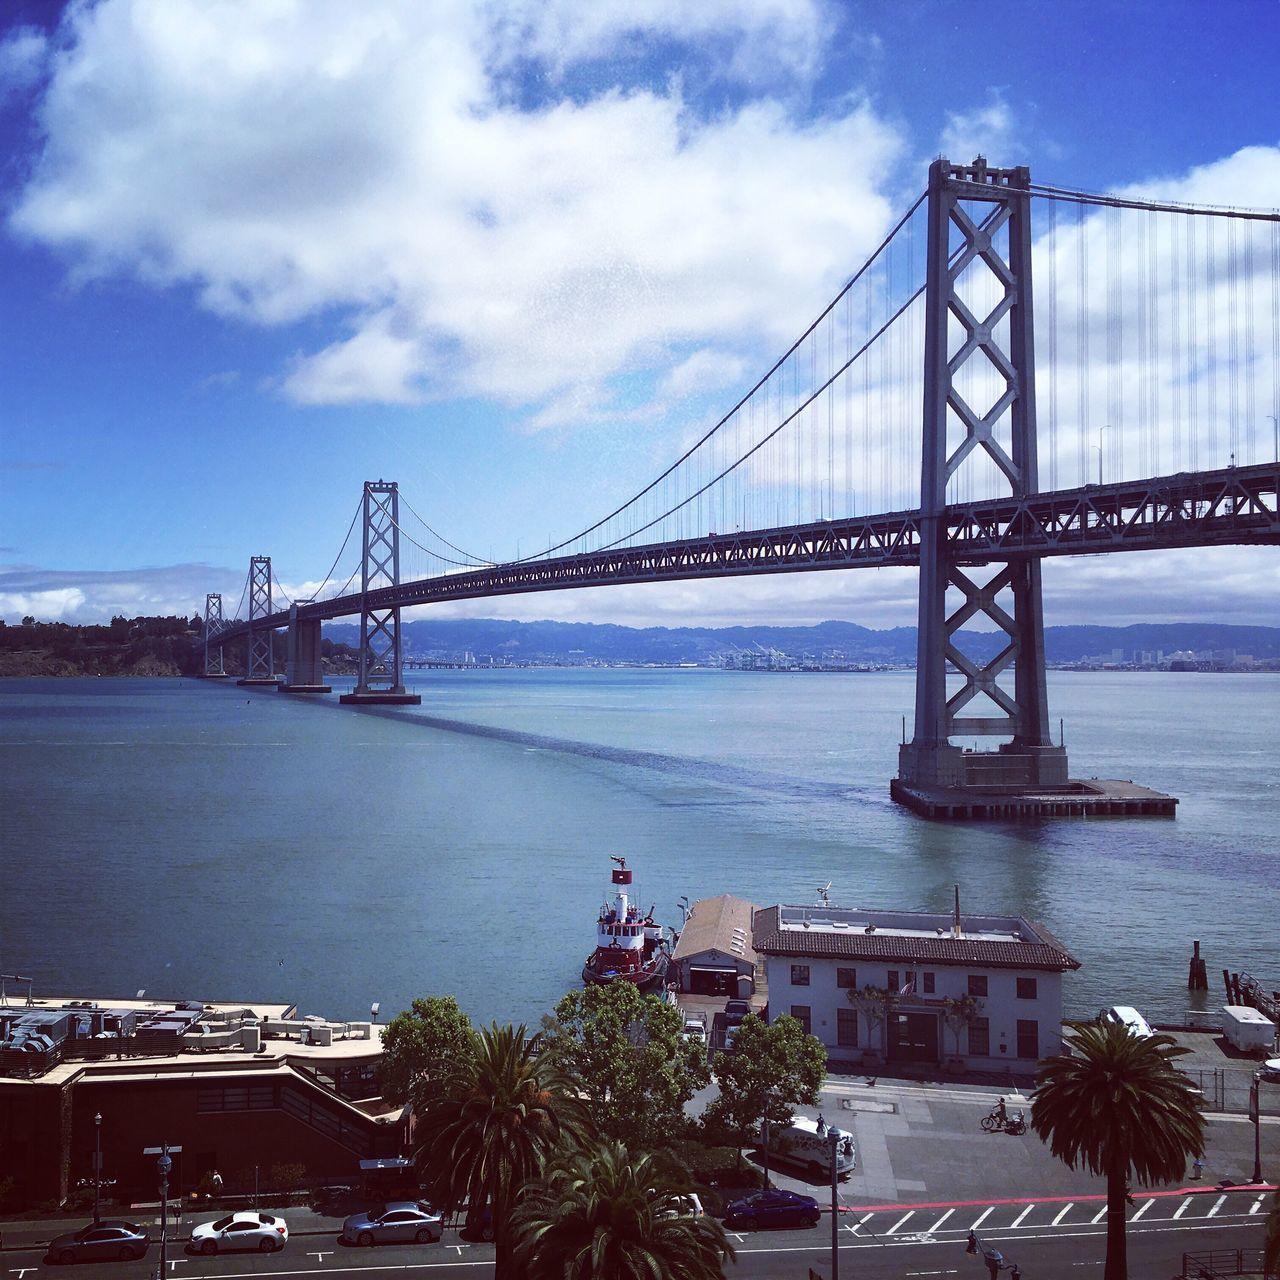 View Of Bay Bridge Over River